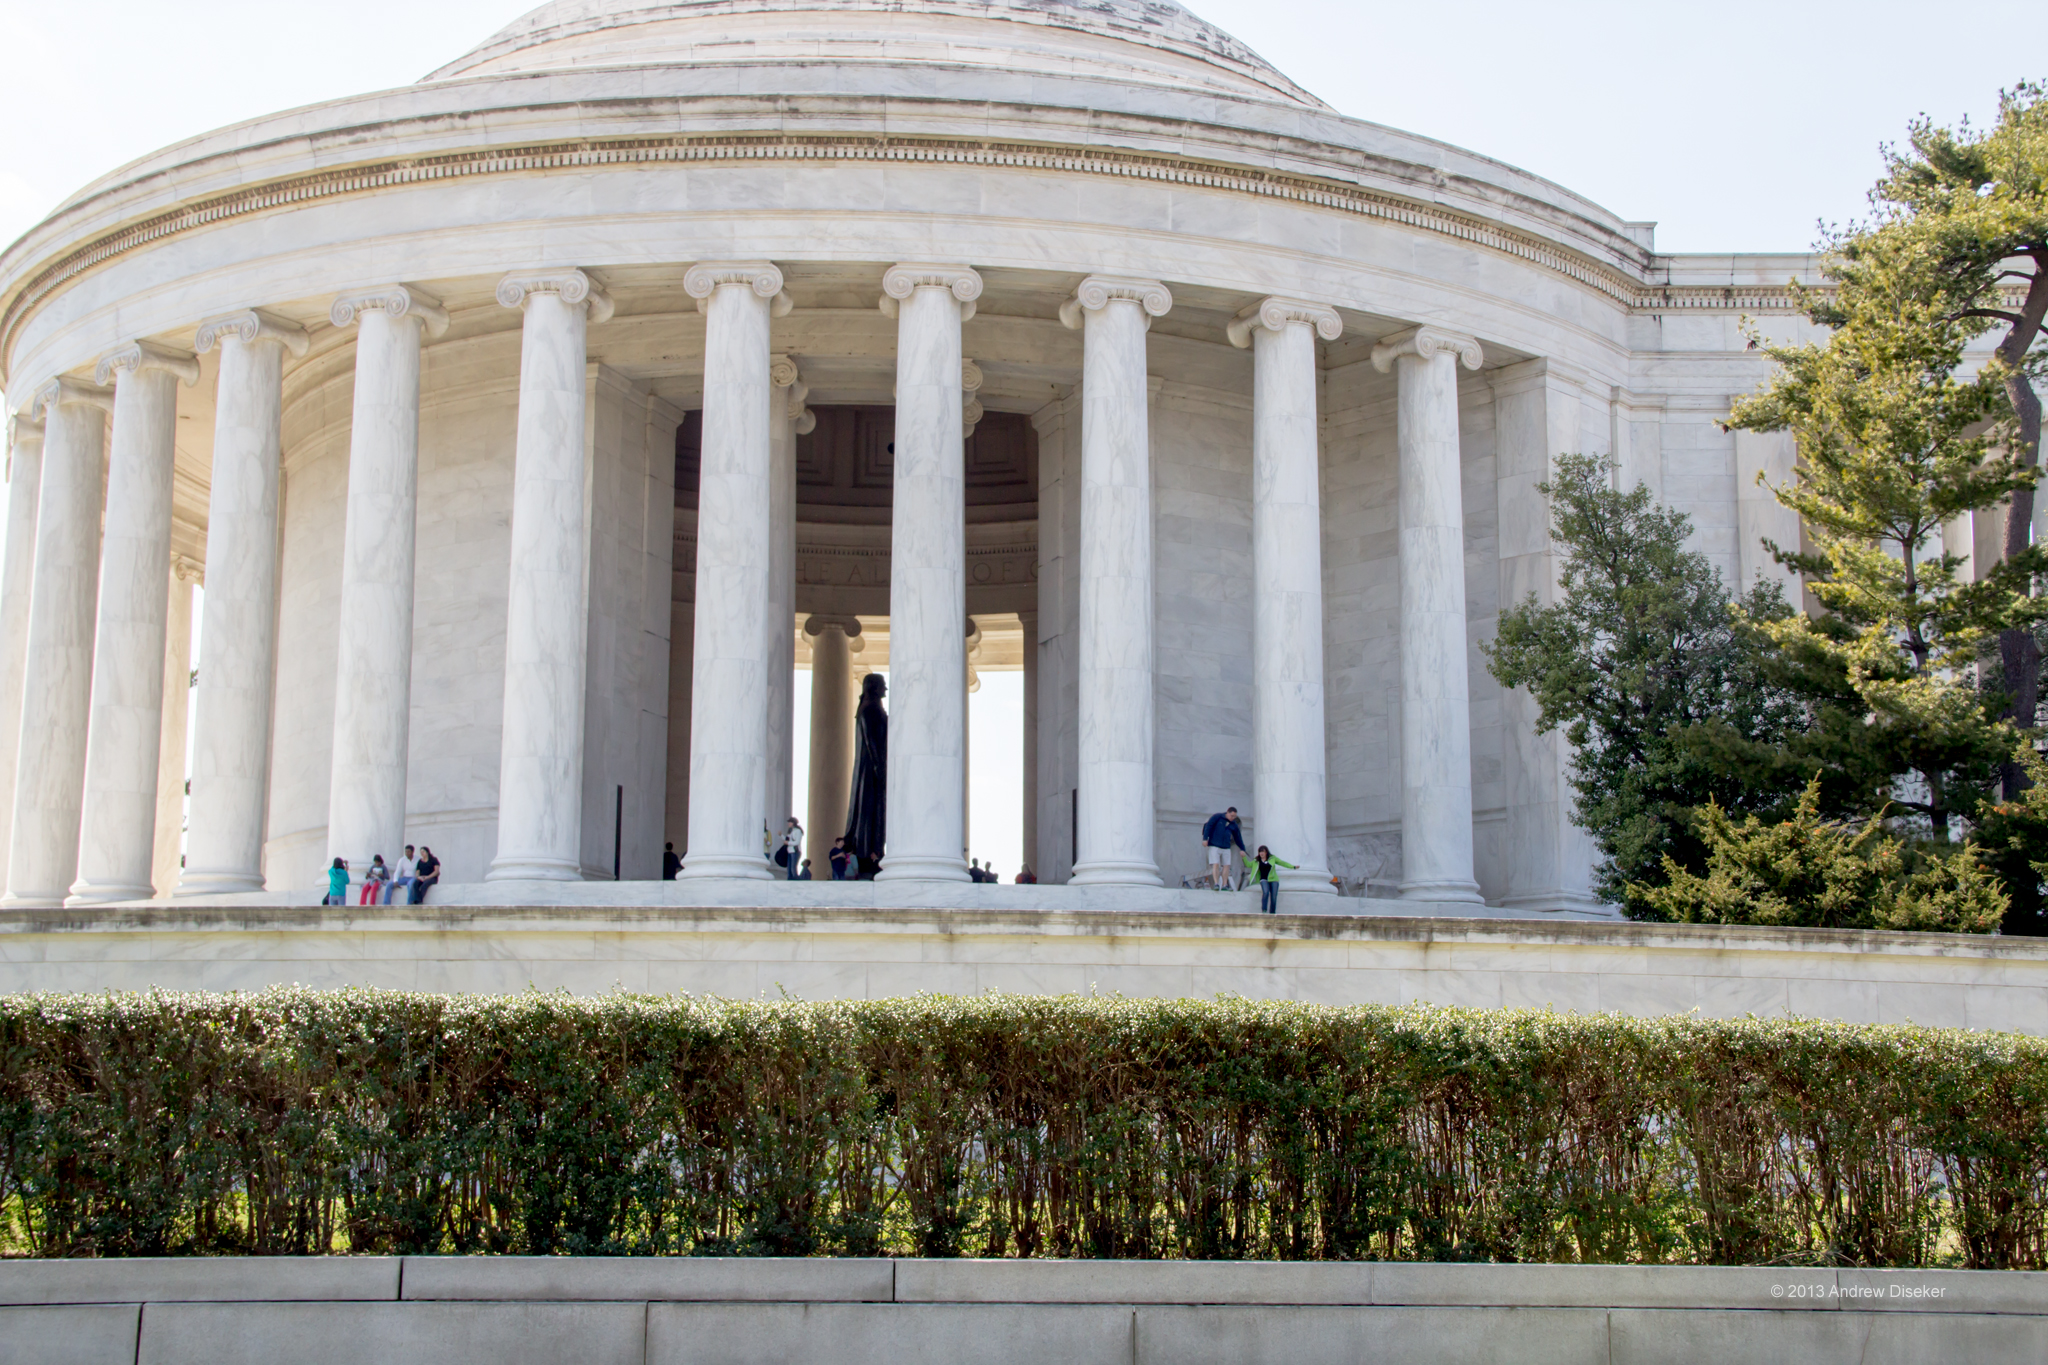 View inside Jefferson Memorial with statue of Thomas Jefferson